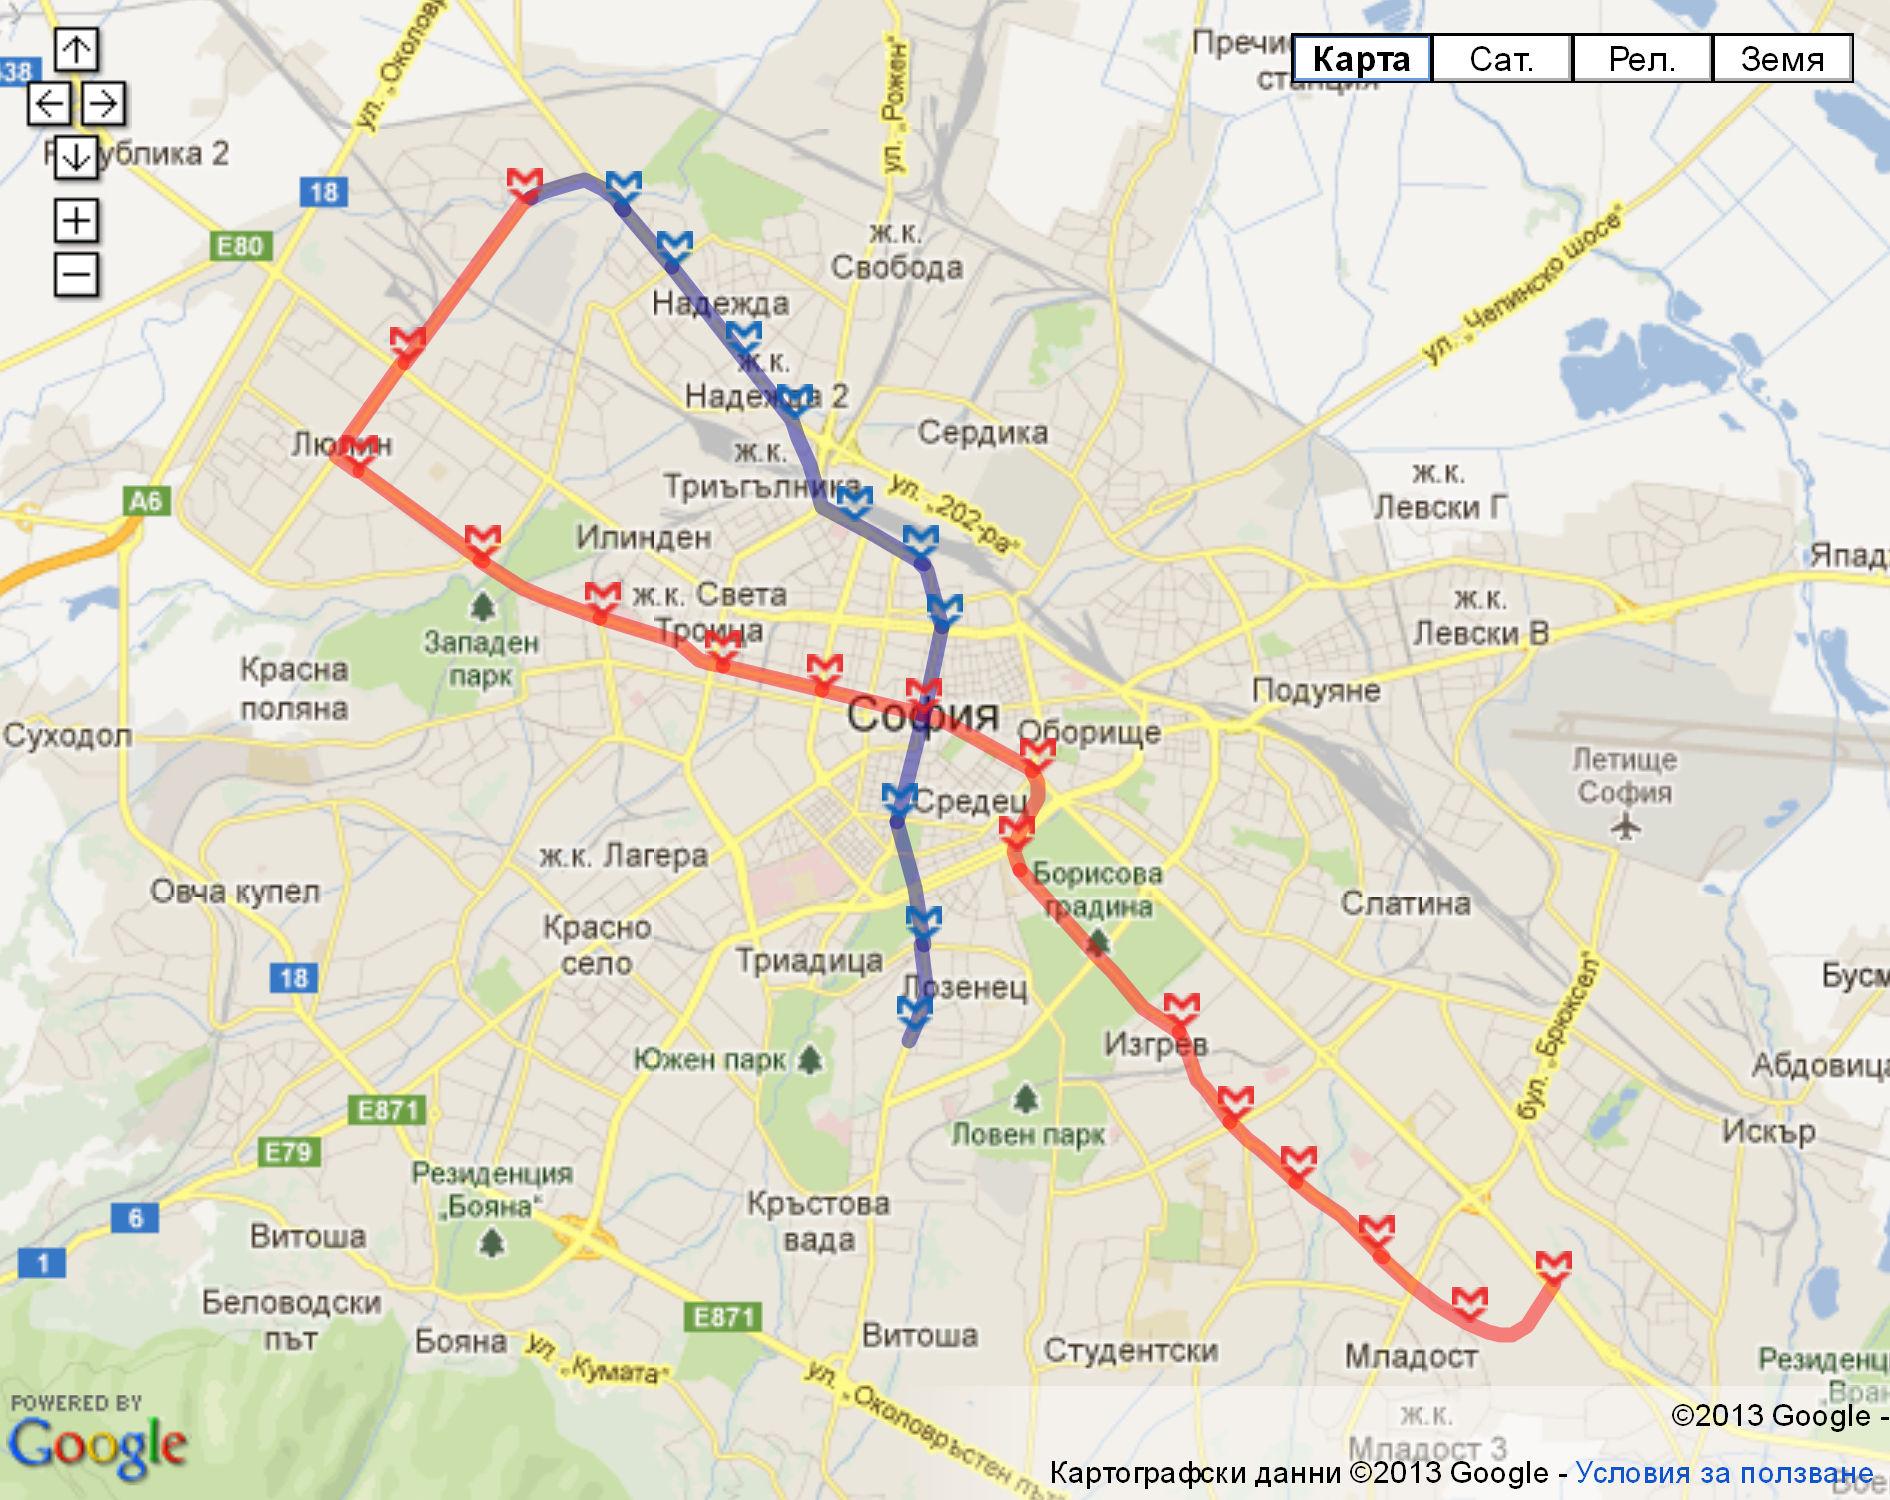 Sofia Subway Map.Map Of Sofia Metro